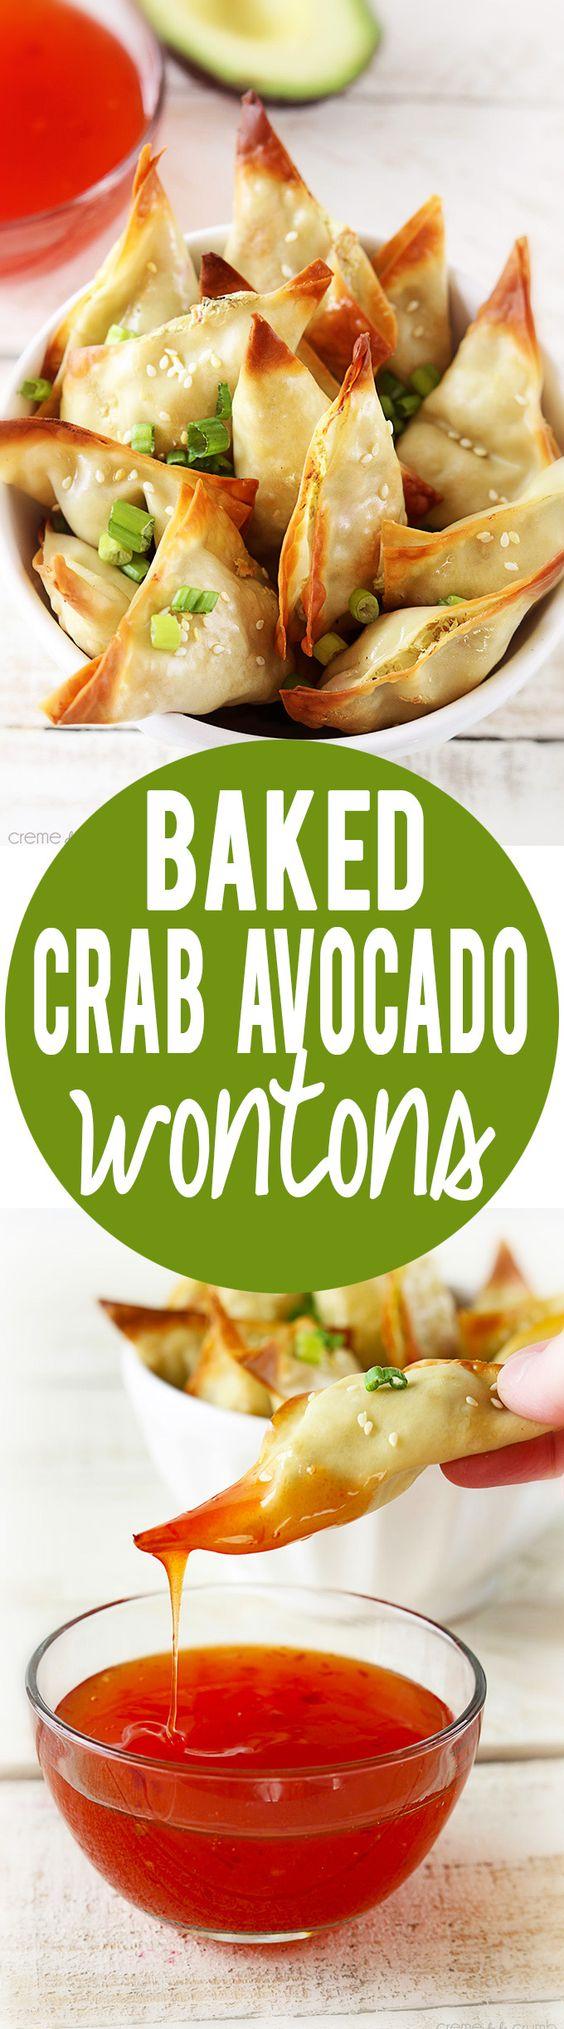 Oven Baked Crab Avocado Wontons   Creme de la Crumb